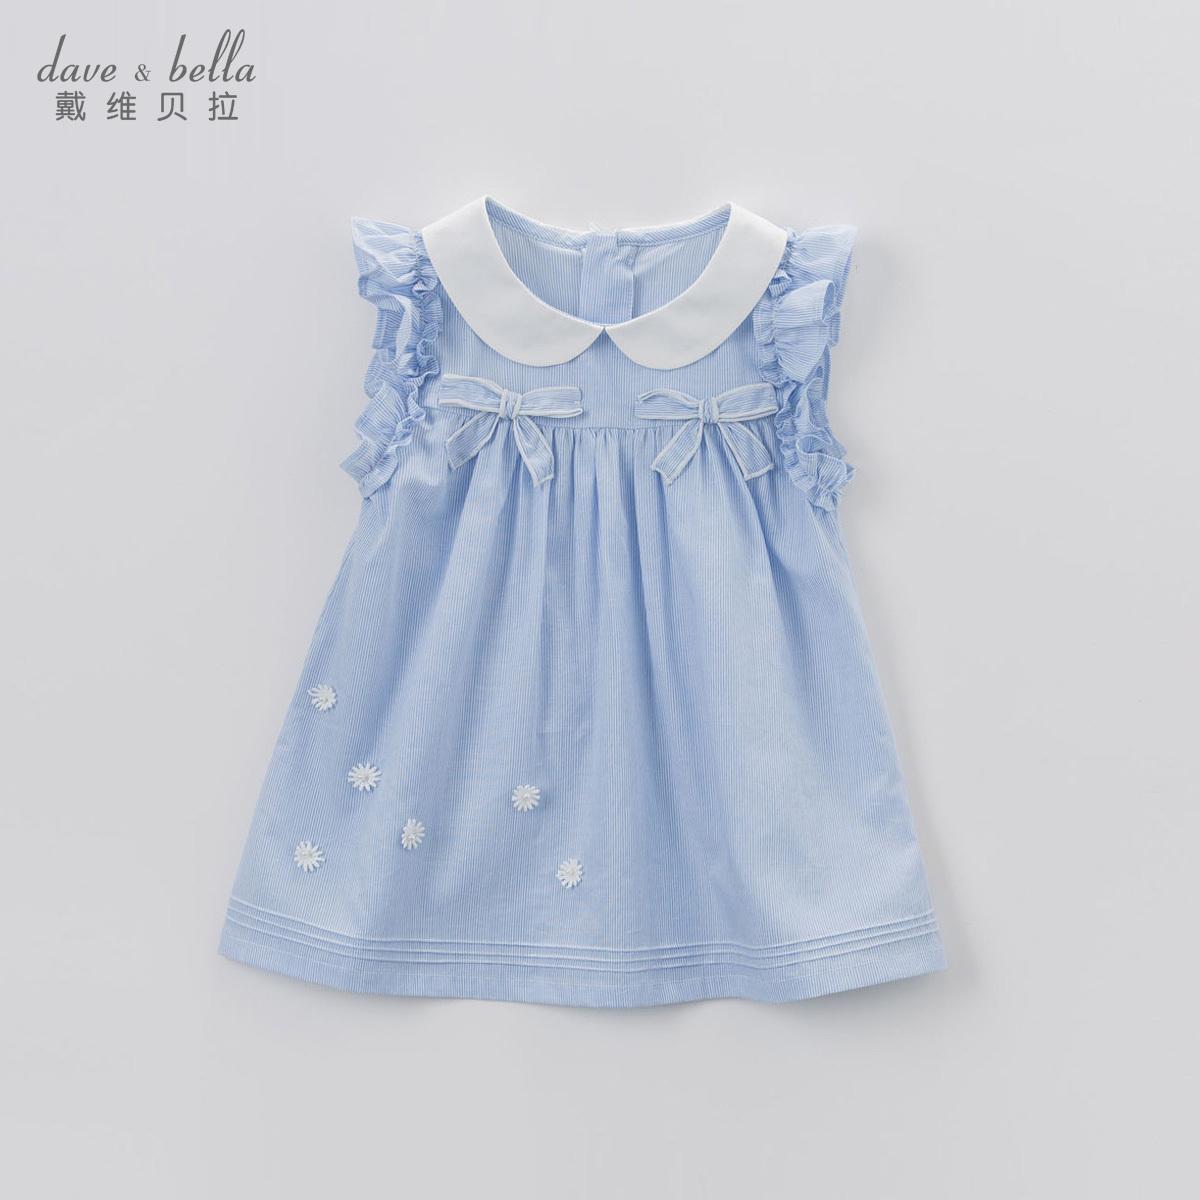 davebella戴维贝拉夏季女宝连衣裙 娃娃领连衣裙DB5057